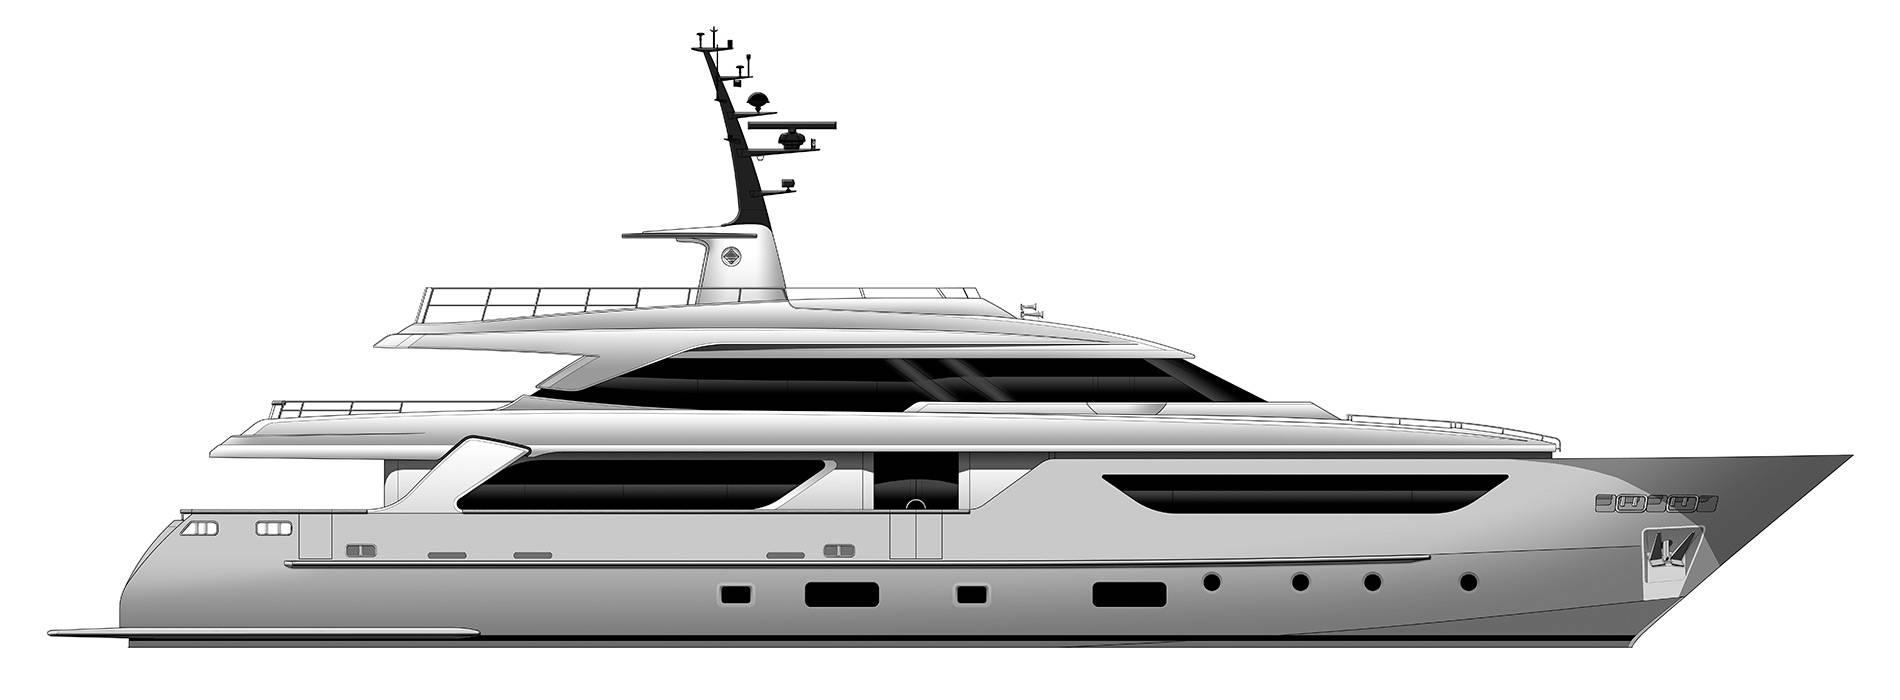 Sanlorenzo Yachts SD126 Perfil